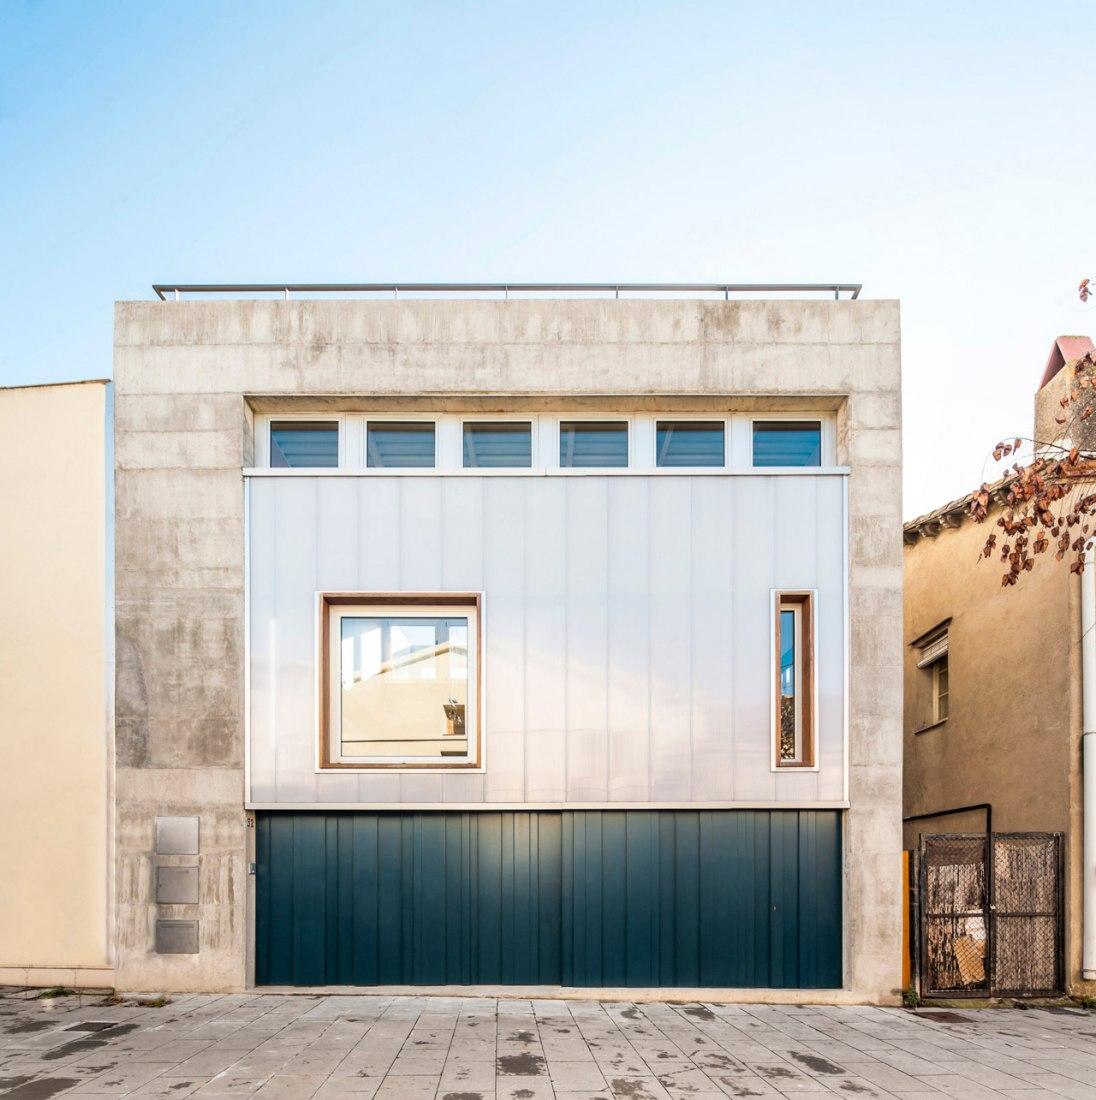 Acceso. Casa Migdia por SAU Taller d'Arquitectura. Fotografía © Andrés Flajszer.